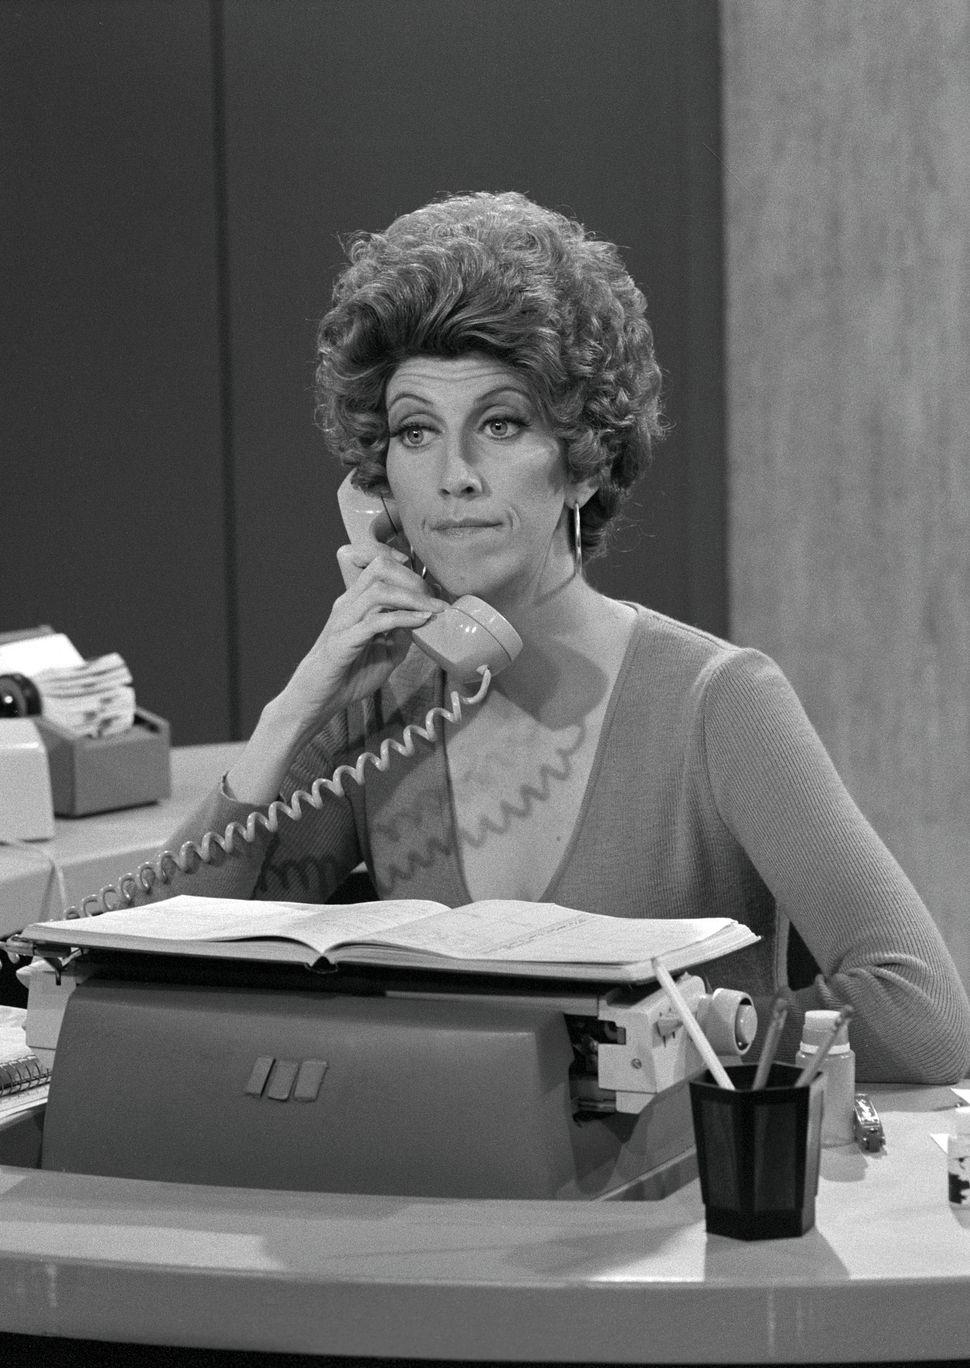 The <em>Bob Newhart Show</em> star and voice of Edna Krabappel on <em>The Simpsons</em> died on Oct. 25 at 70.